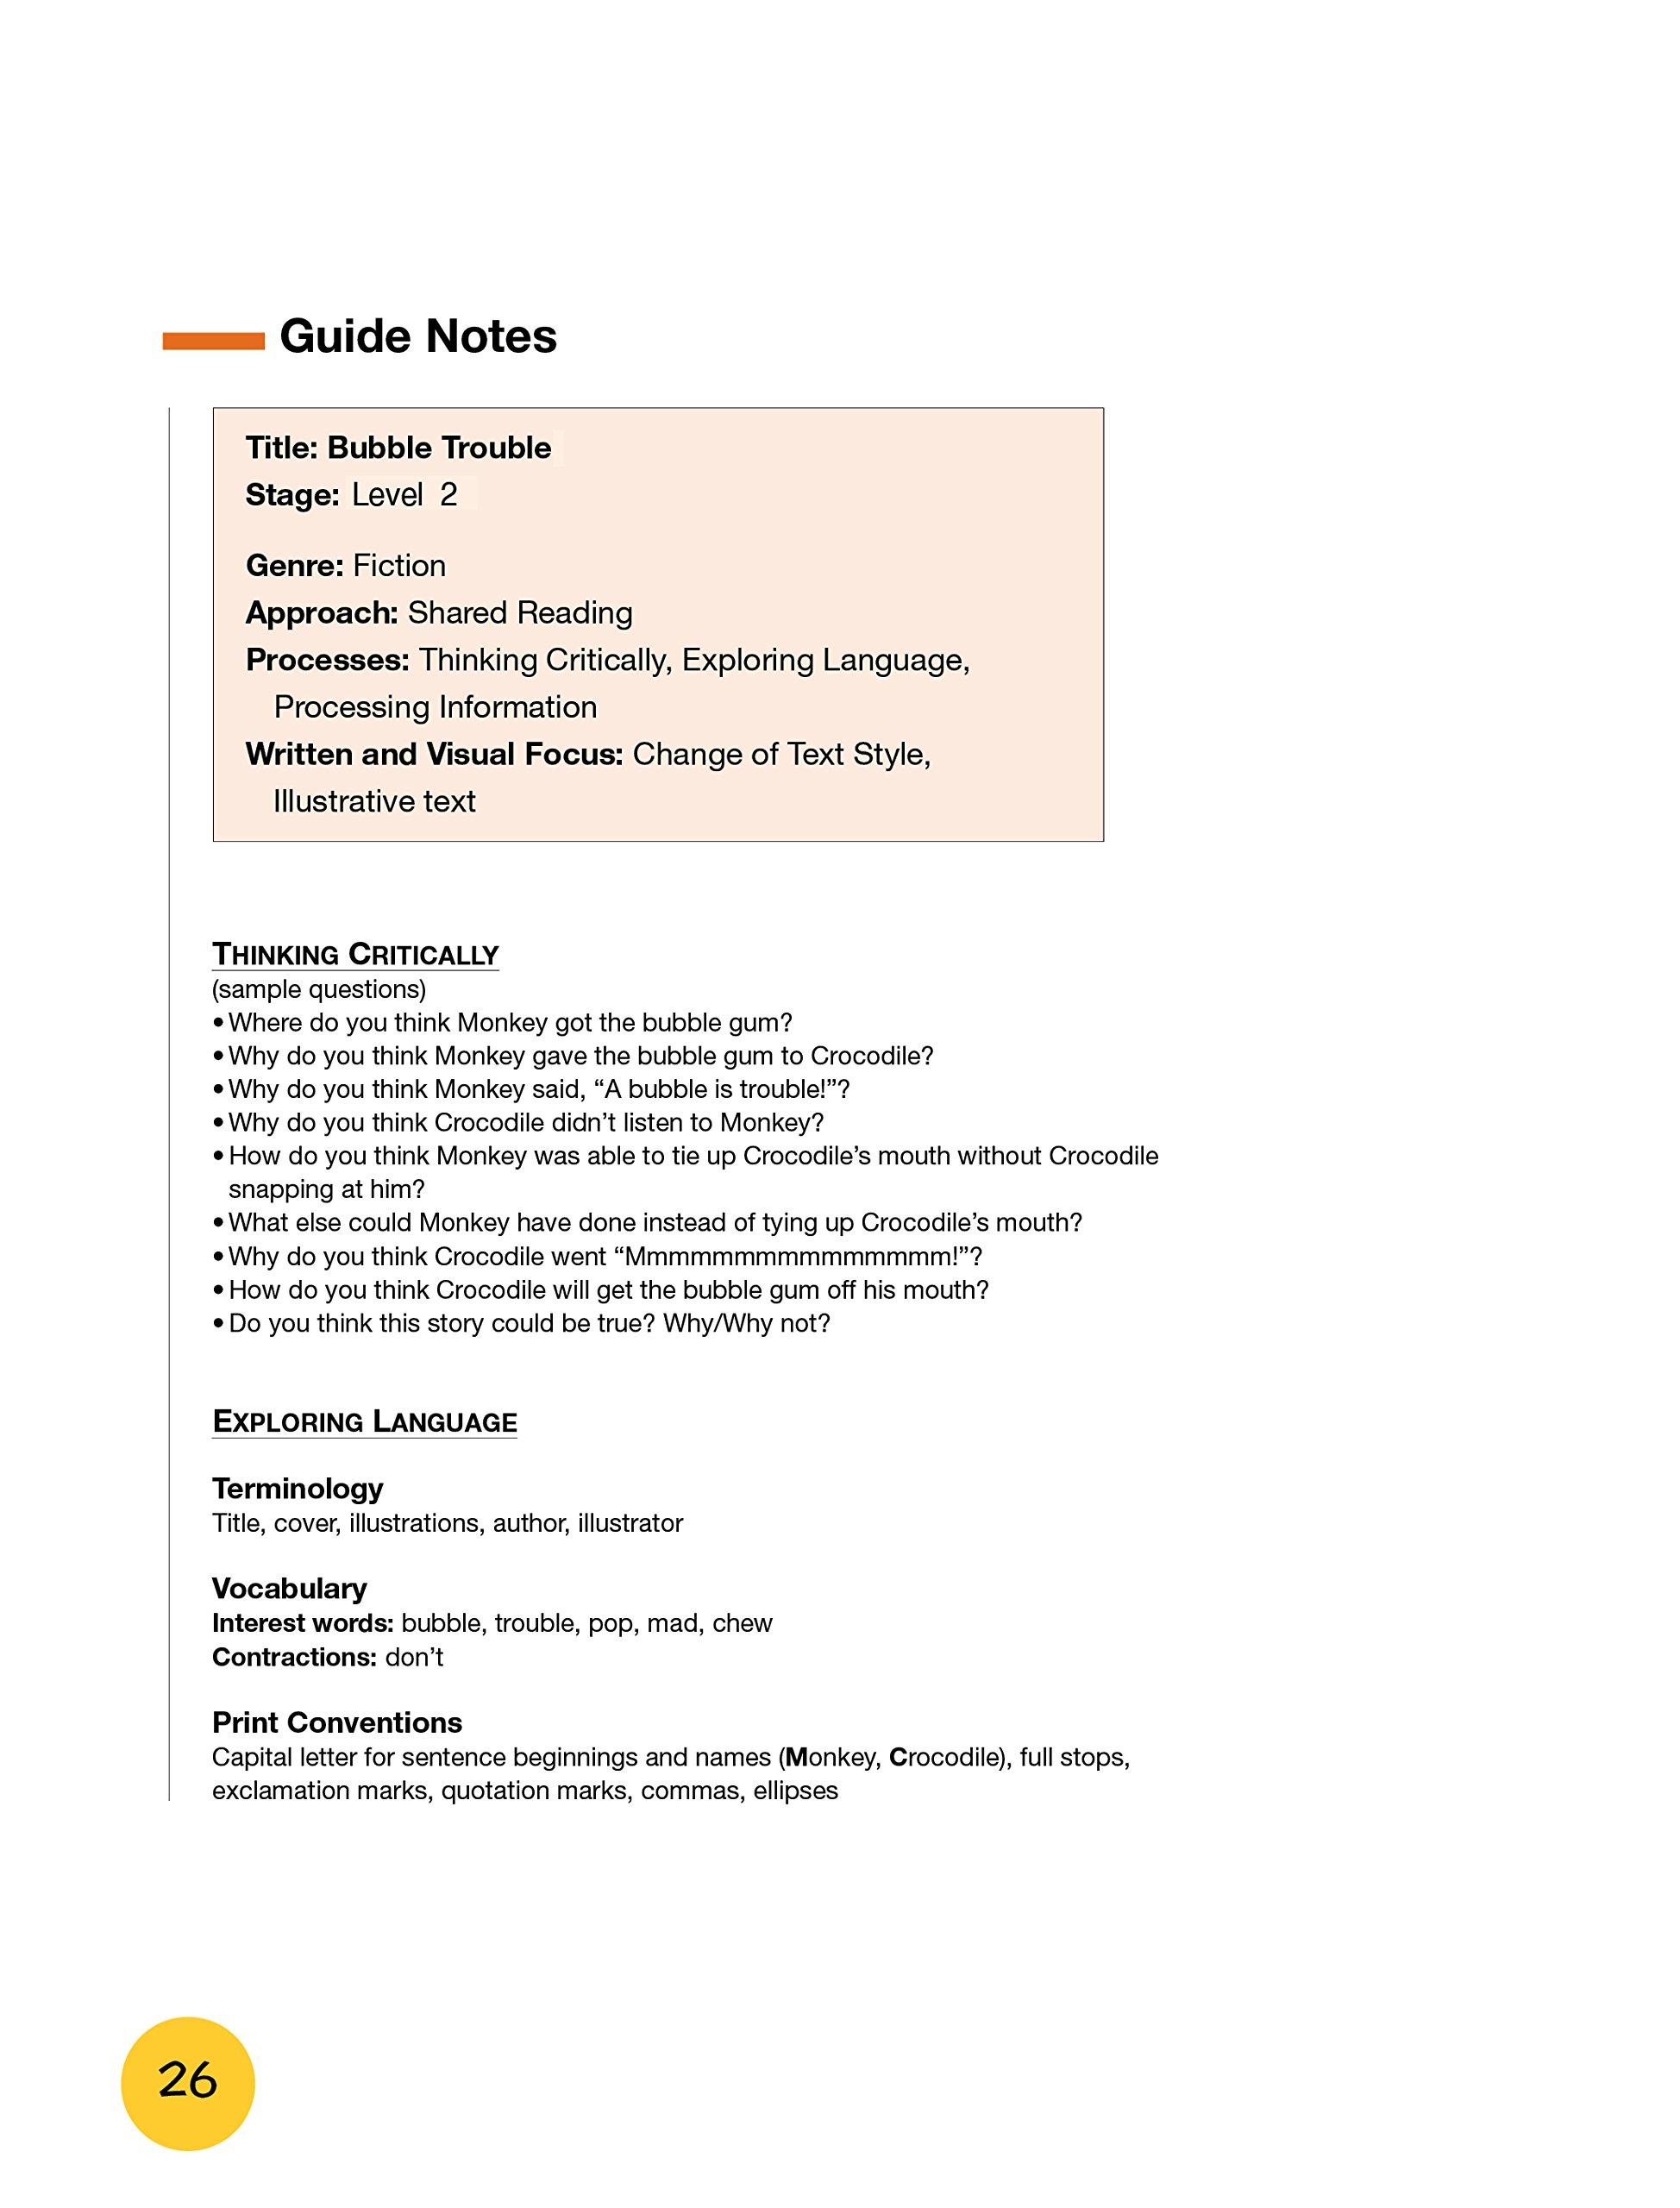 领航船 培生英语分级绘本 2 1 Bubble Trouble Amazon Com Books